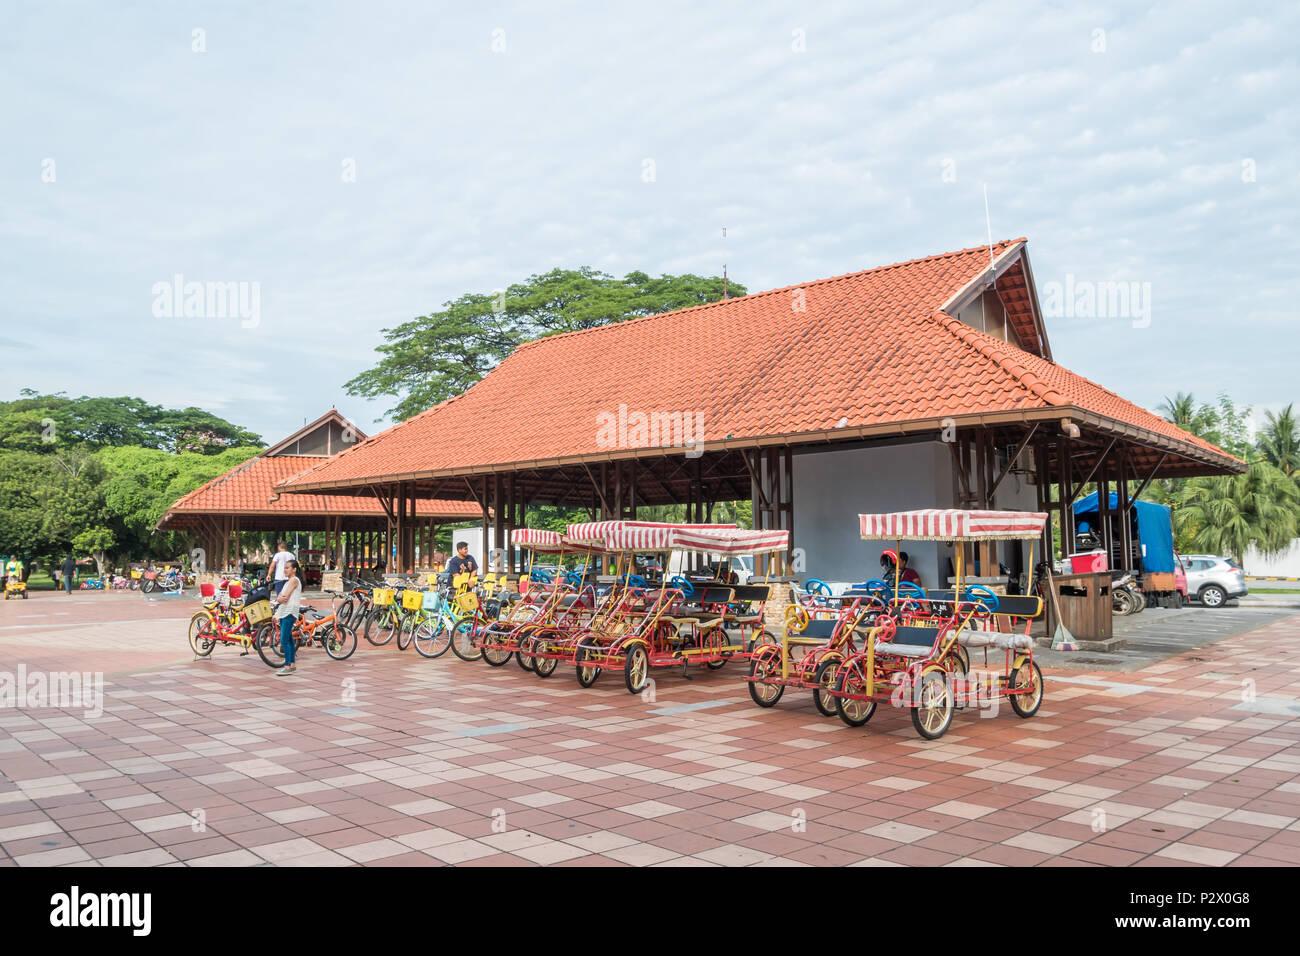 Kuala Lumpur, Malaysia - May 29,2018 : Bike rental for public in Titiwangsa Lake Gardens, it is a recreational park with a large lake. - Stock Image